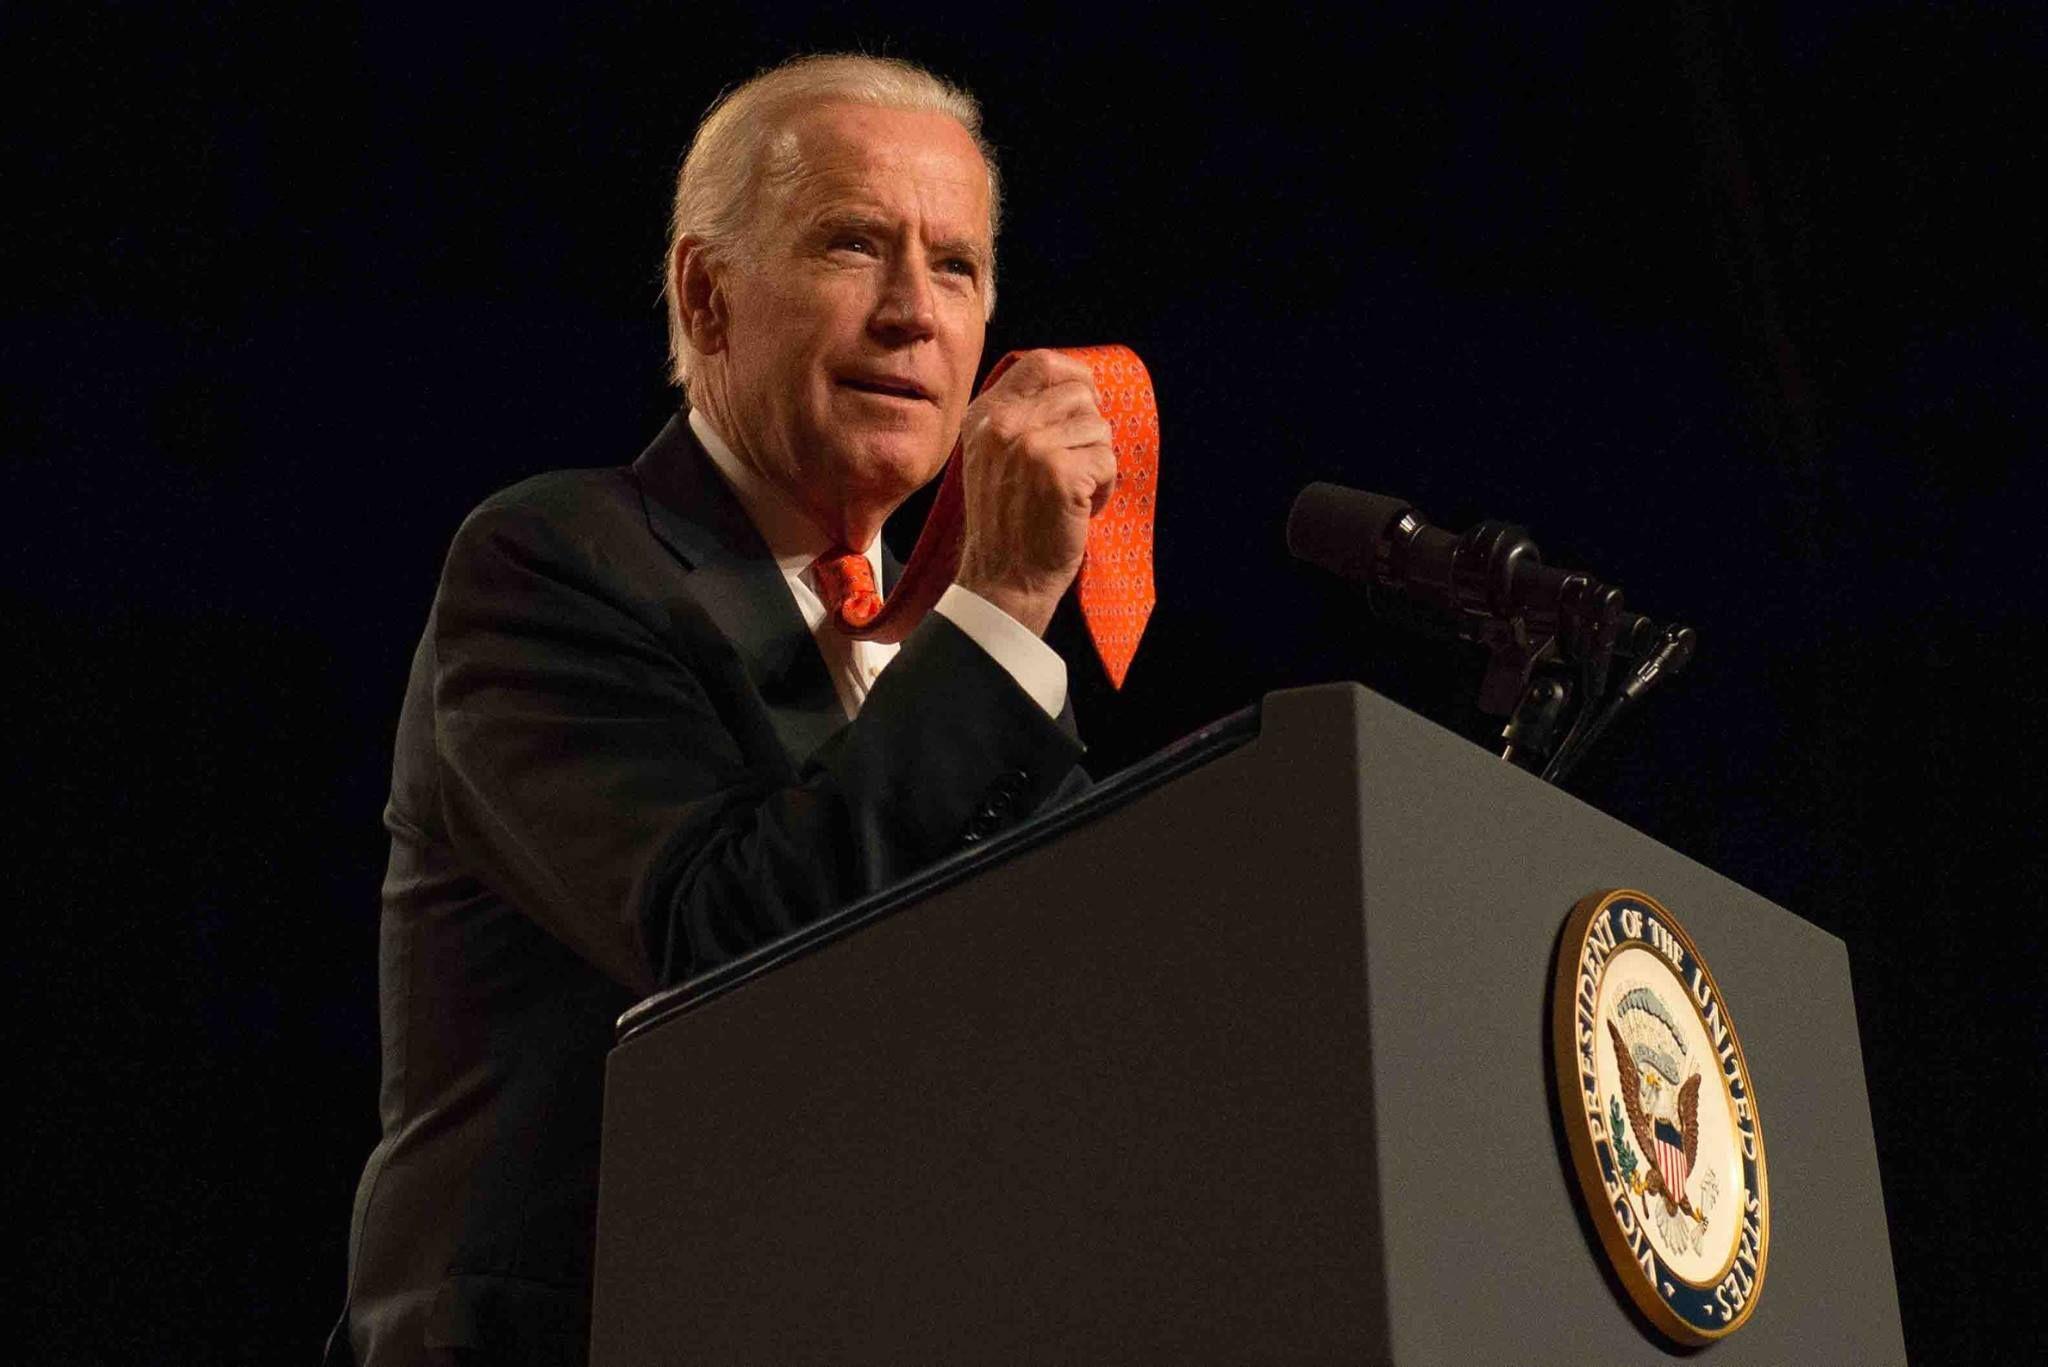 Vice President Joe Biden Speaking At Su And Showing Off His Orange Tie 11 12 15 Syracuse University Vice Syracuse